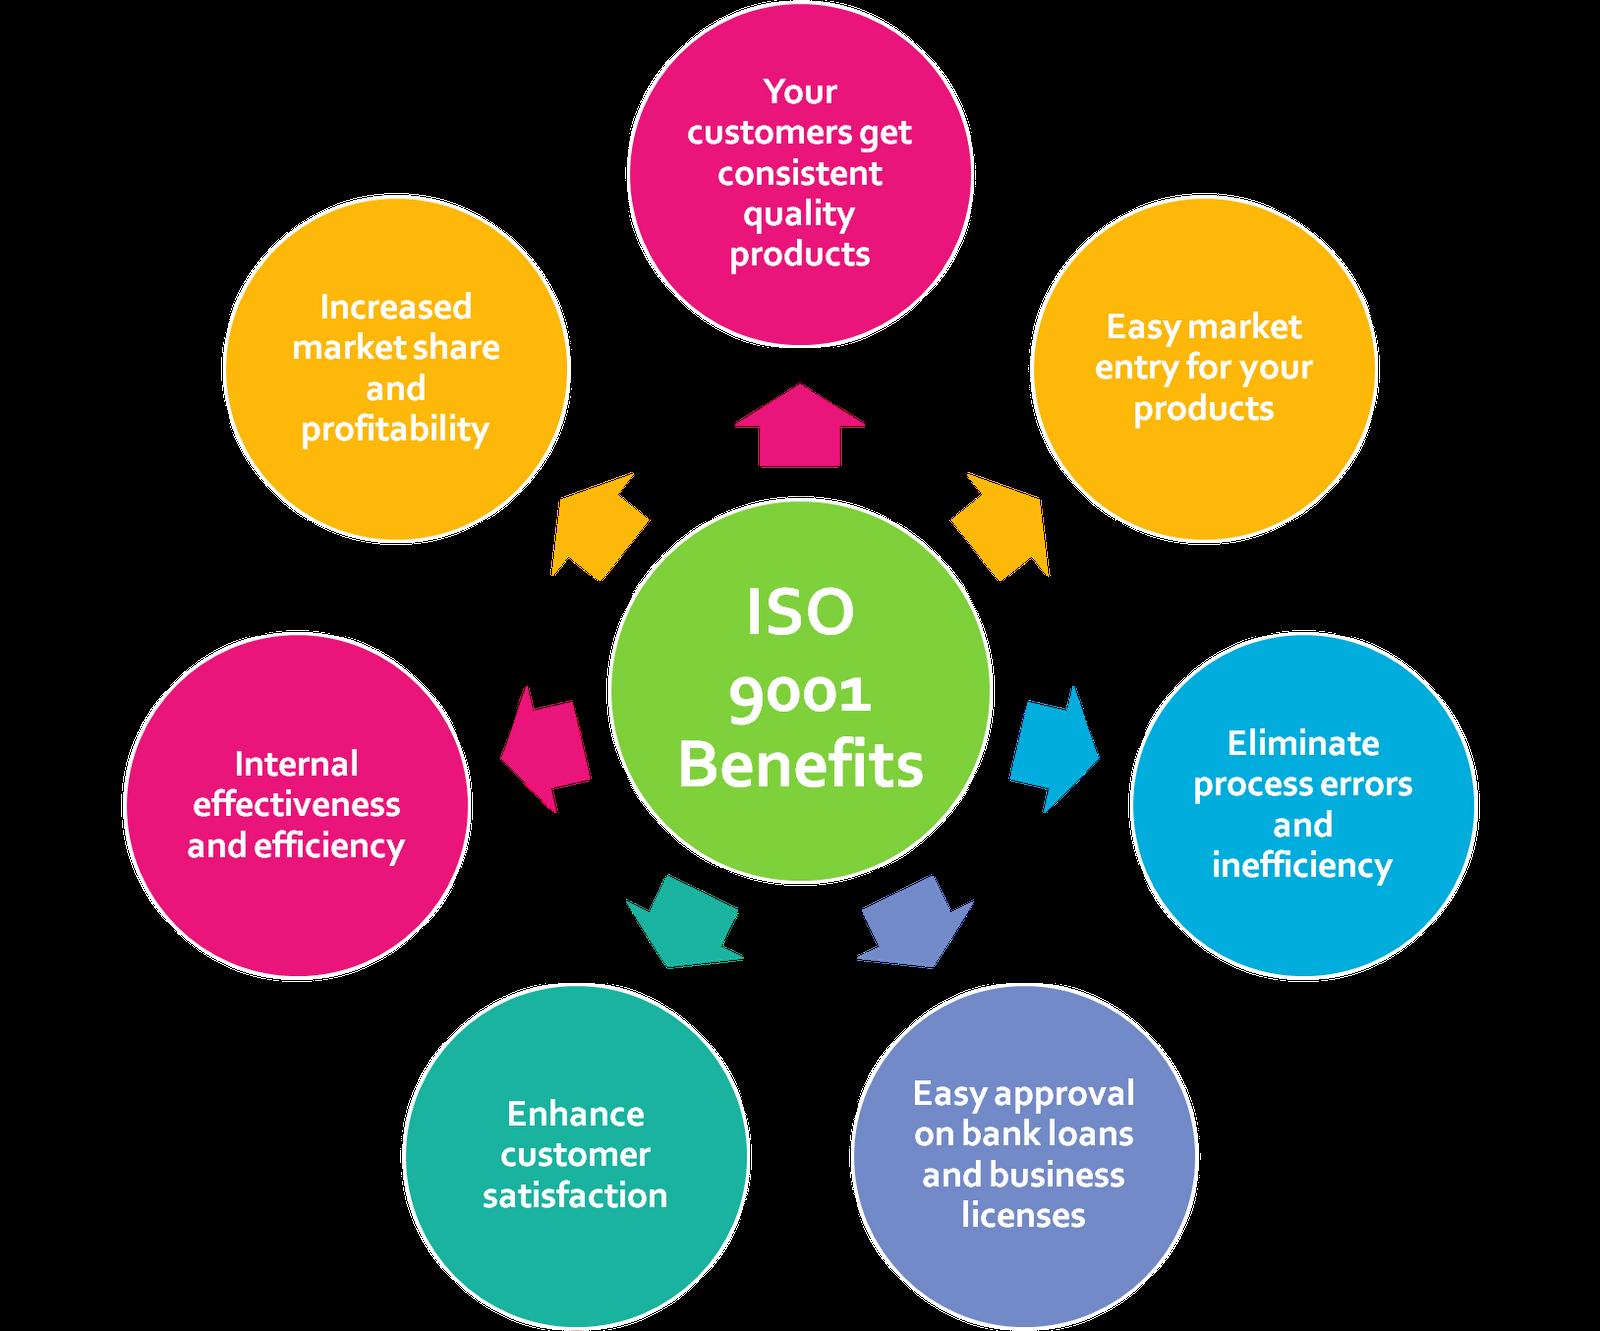 Global Standards Iso 9001 Certification